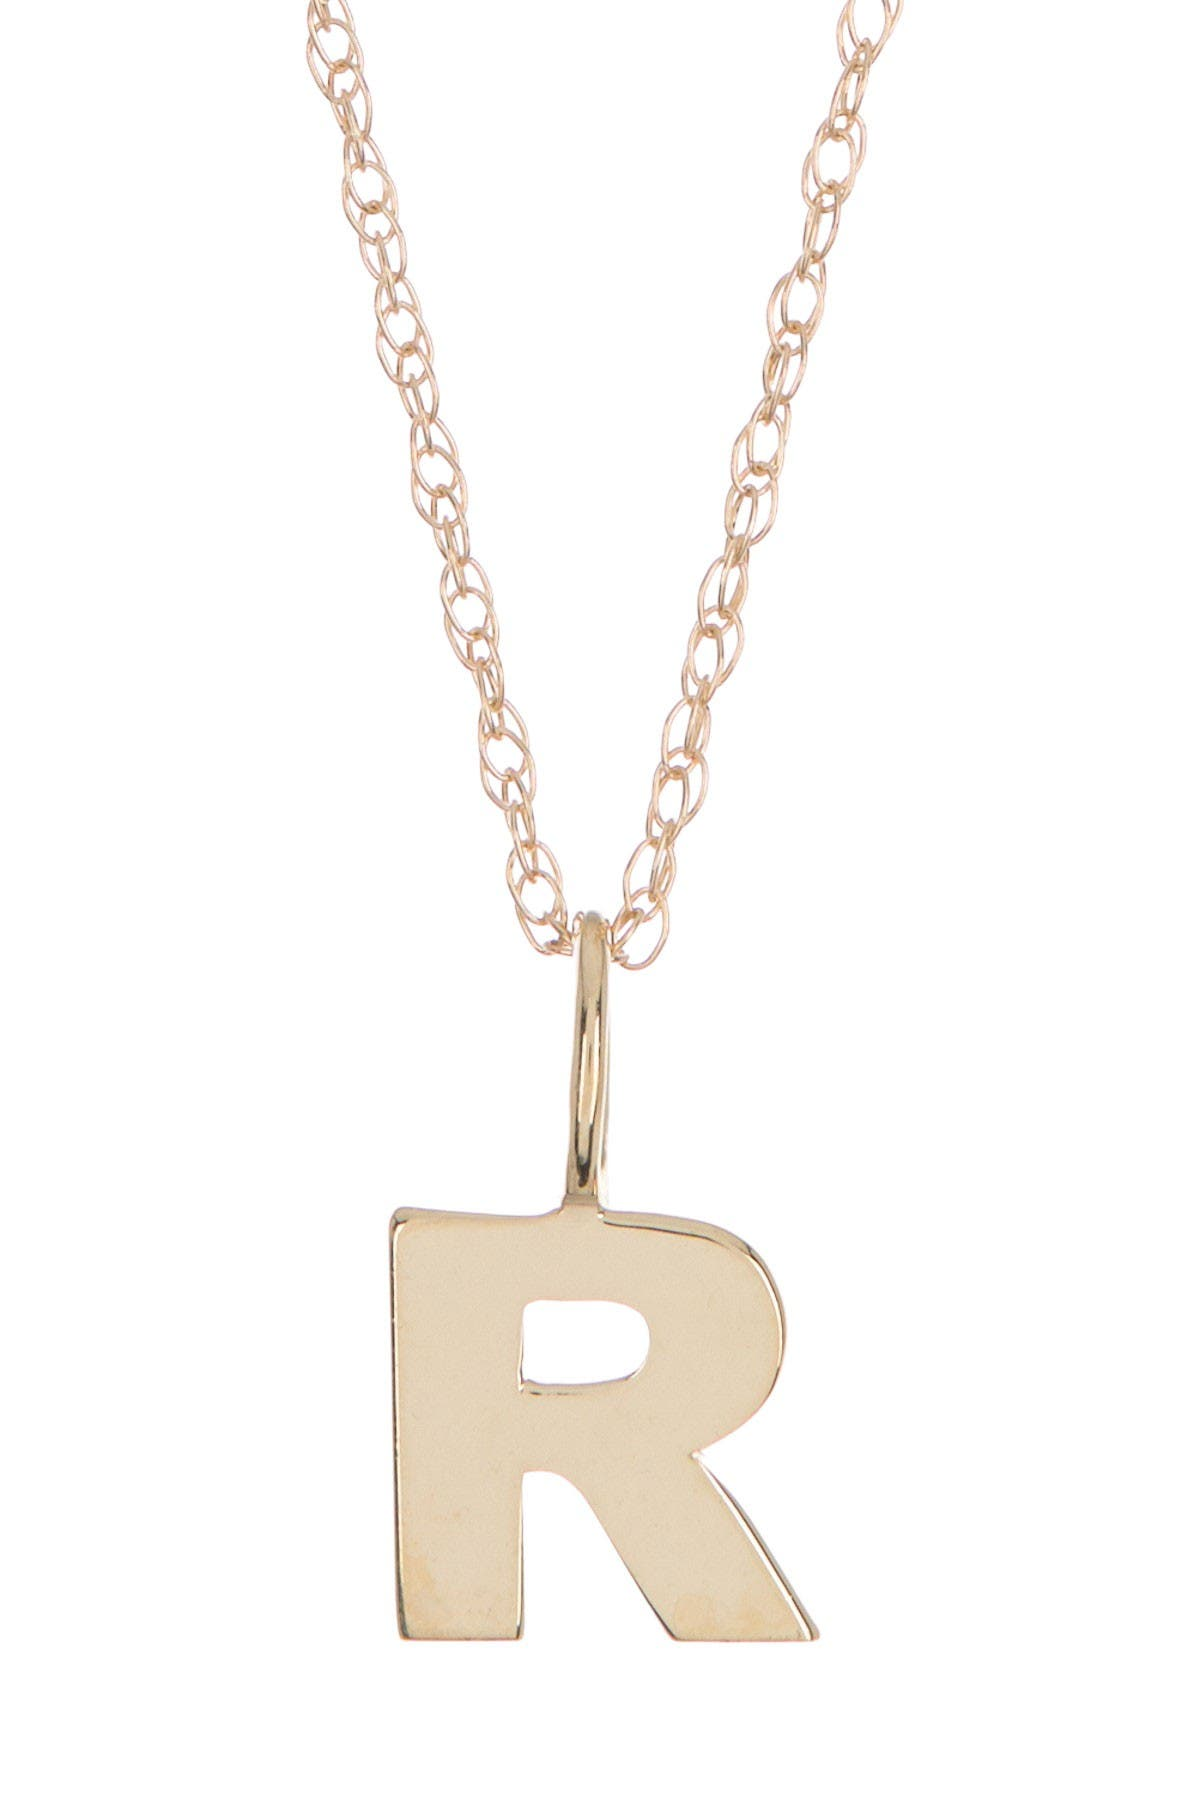 Image of Candela 10K Yellow Gold Iniital Pendant Necklace